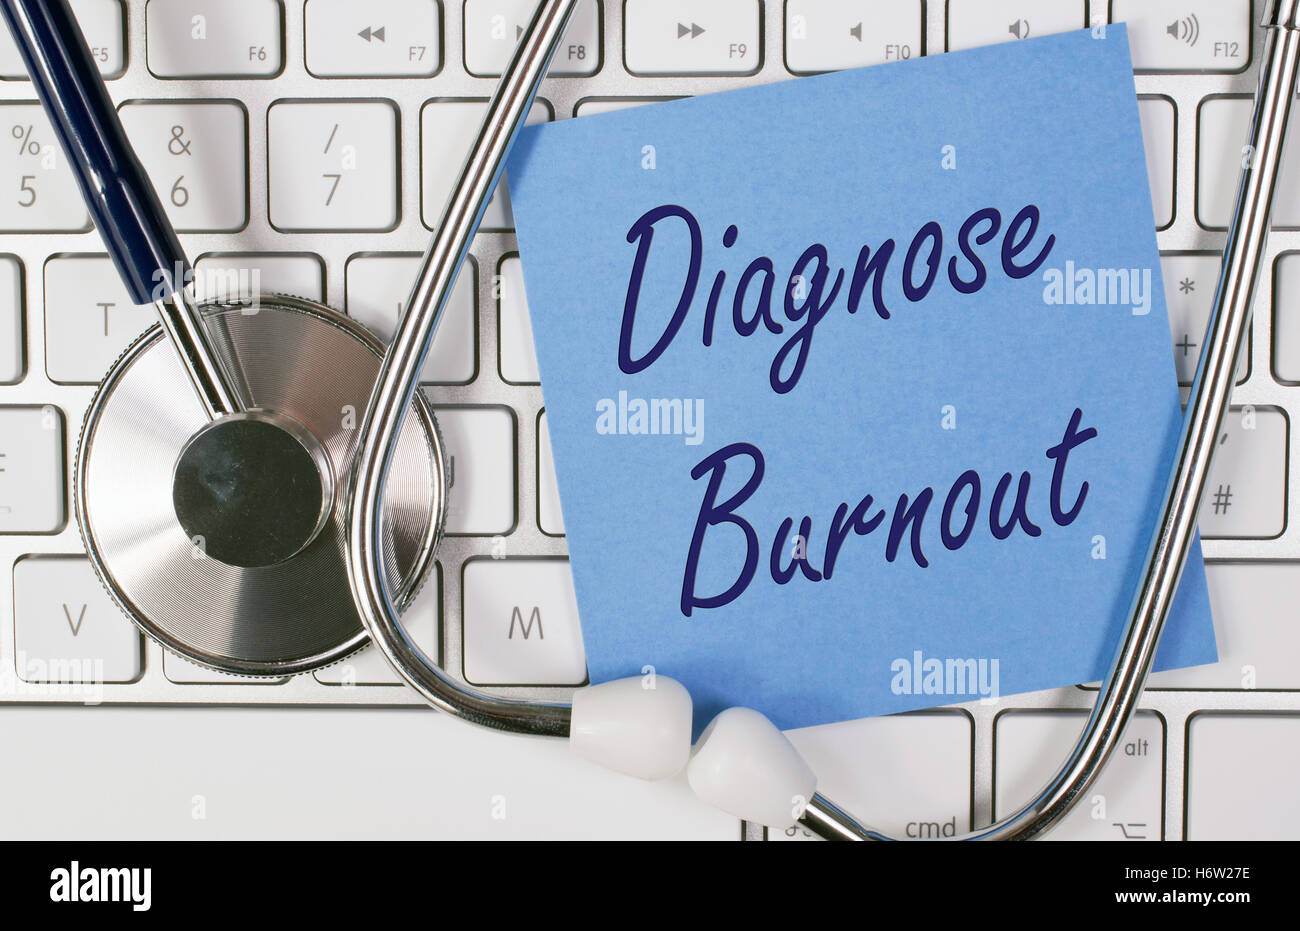 diagnosis burnout - Stock Image